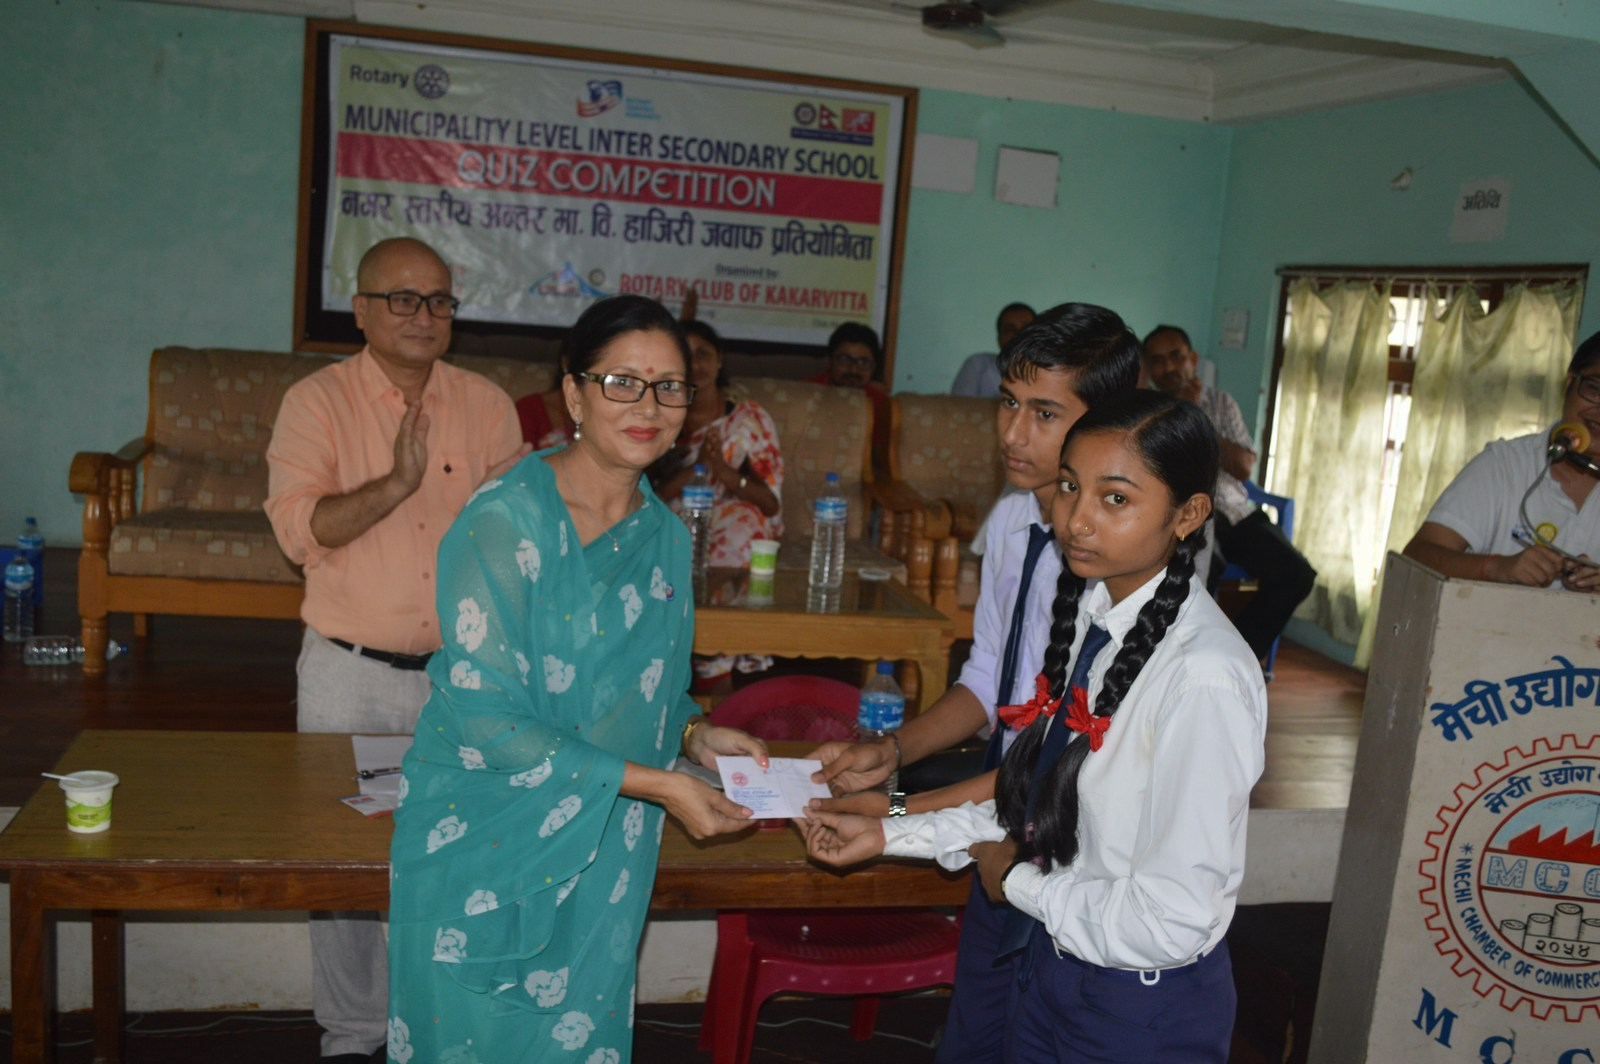 Municipality-Level-Inter-Secondary-School-Quiz-Contest-2016-Rotary-Club-of-Kakarvitta-62